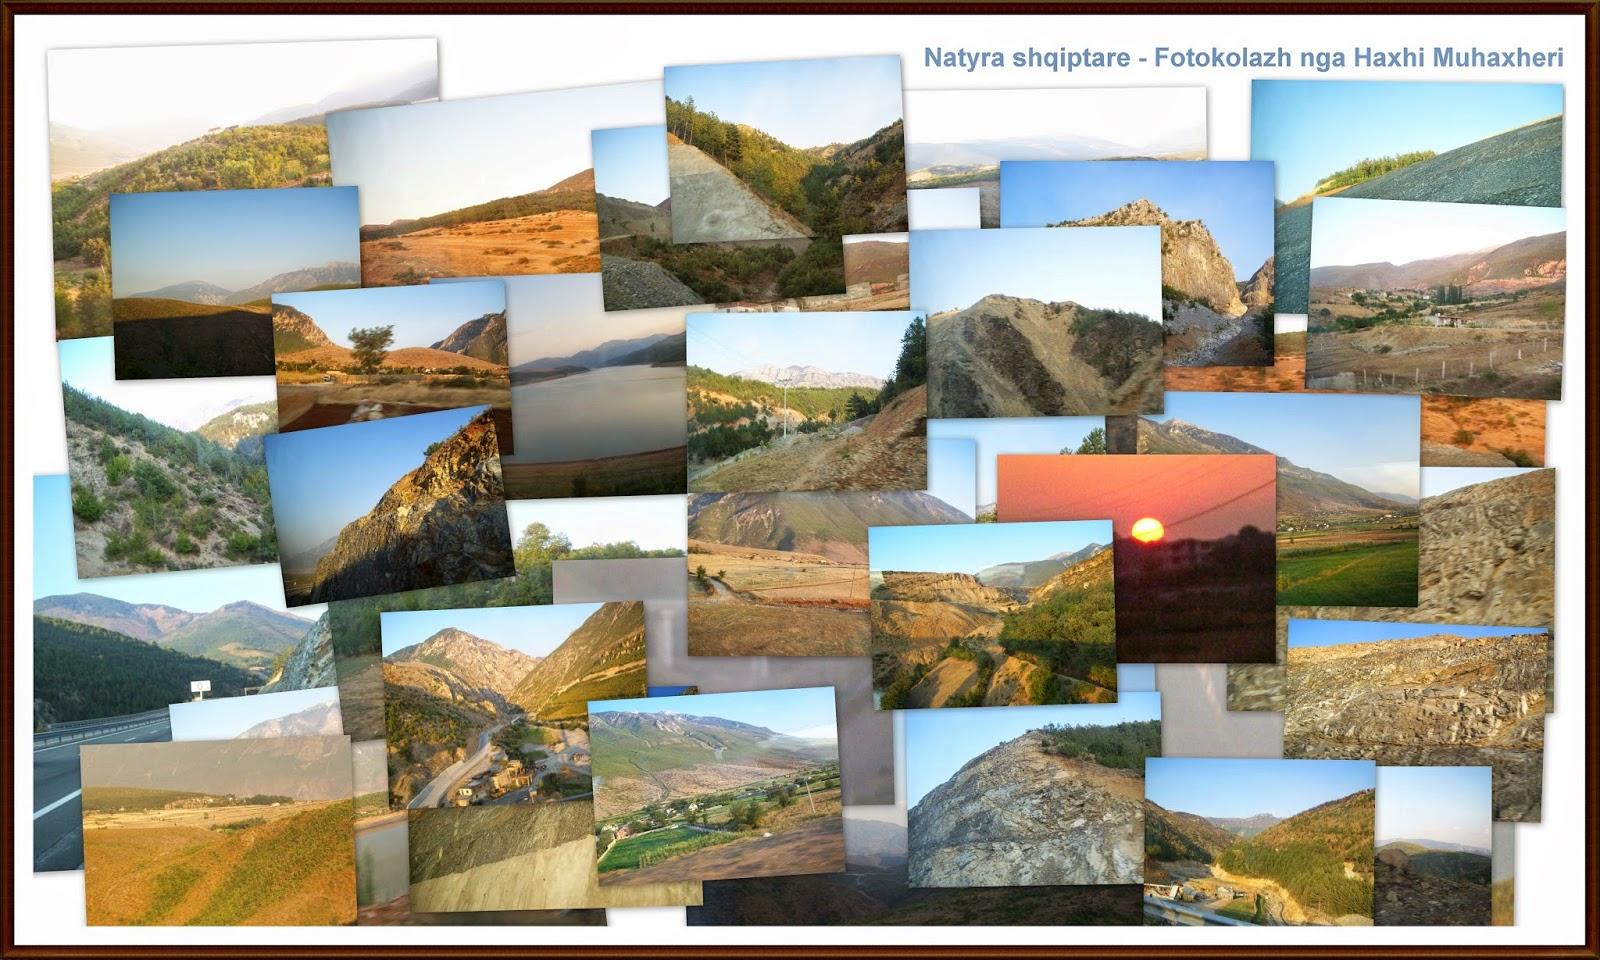 Natyra shqiptare - Fotokollazh nga Haxhi Muhaxheri Natyra%2Bshqiptare%2B-%2BFotokolazh%2BHaxhi%2BMuhaxheri